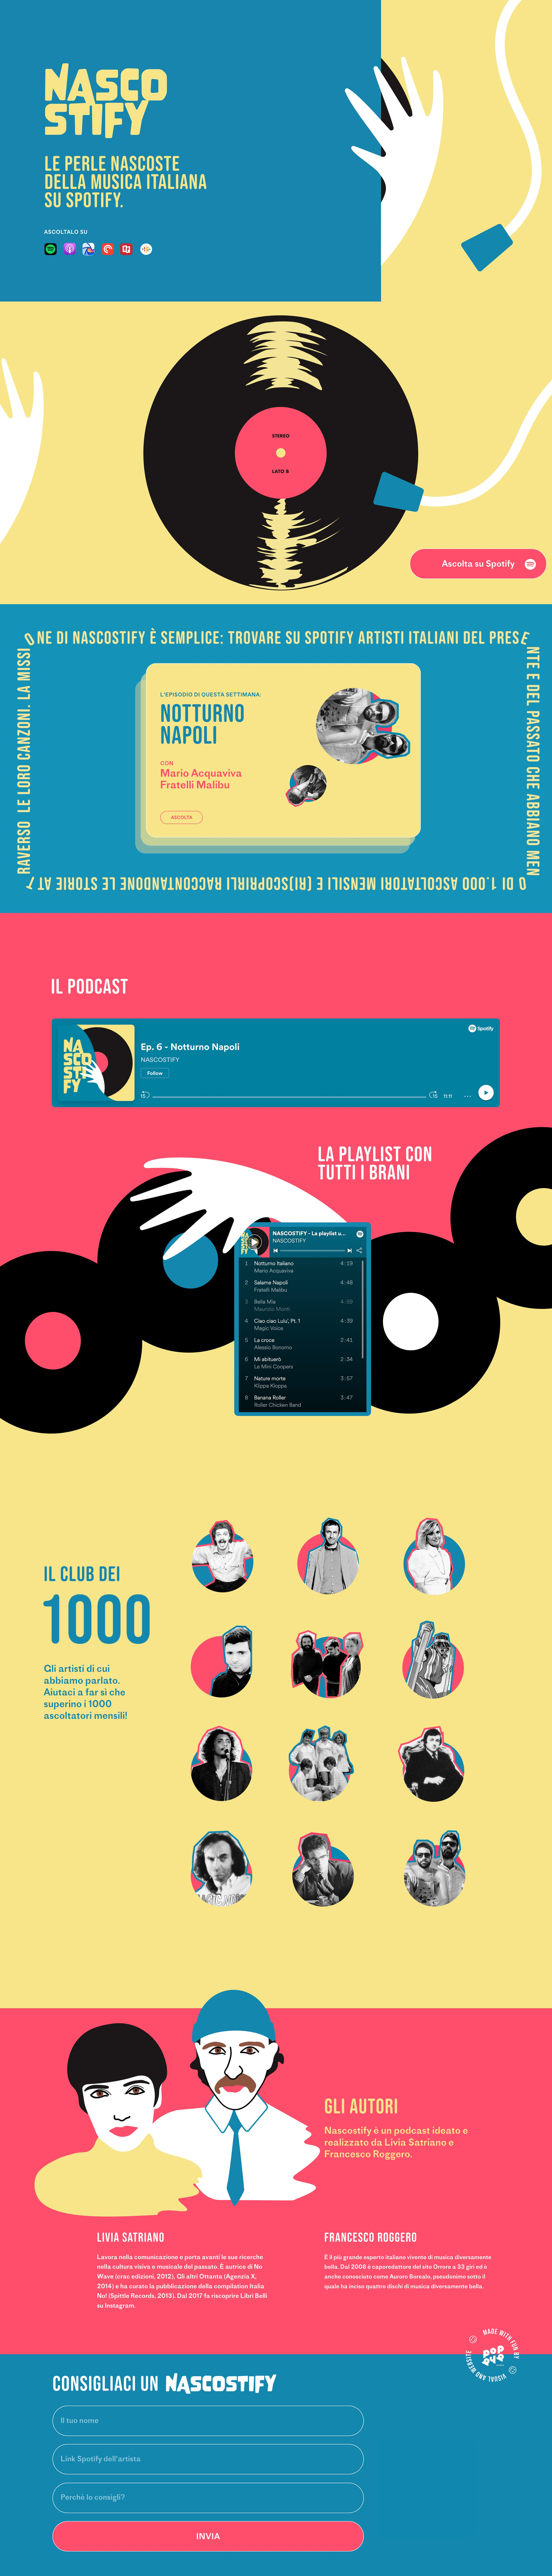 Nascostify Website Screenshot